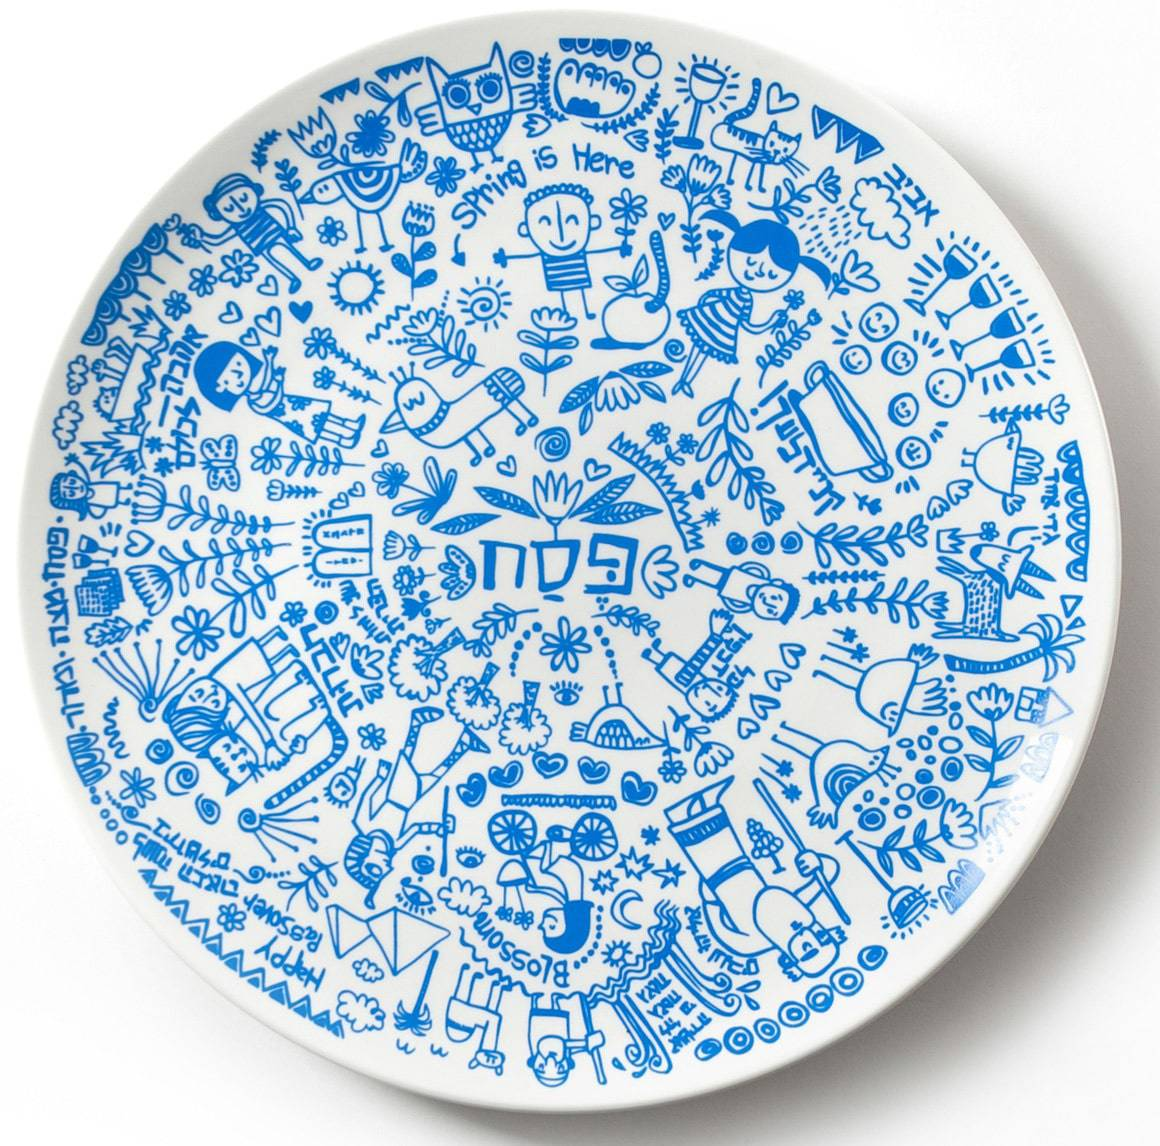 Plato de Seder - Hagada Ilustrada